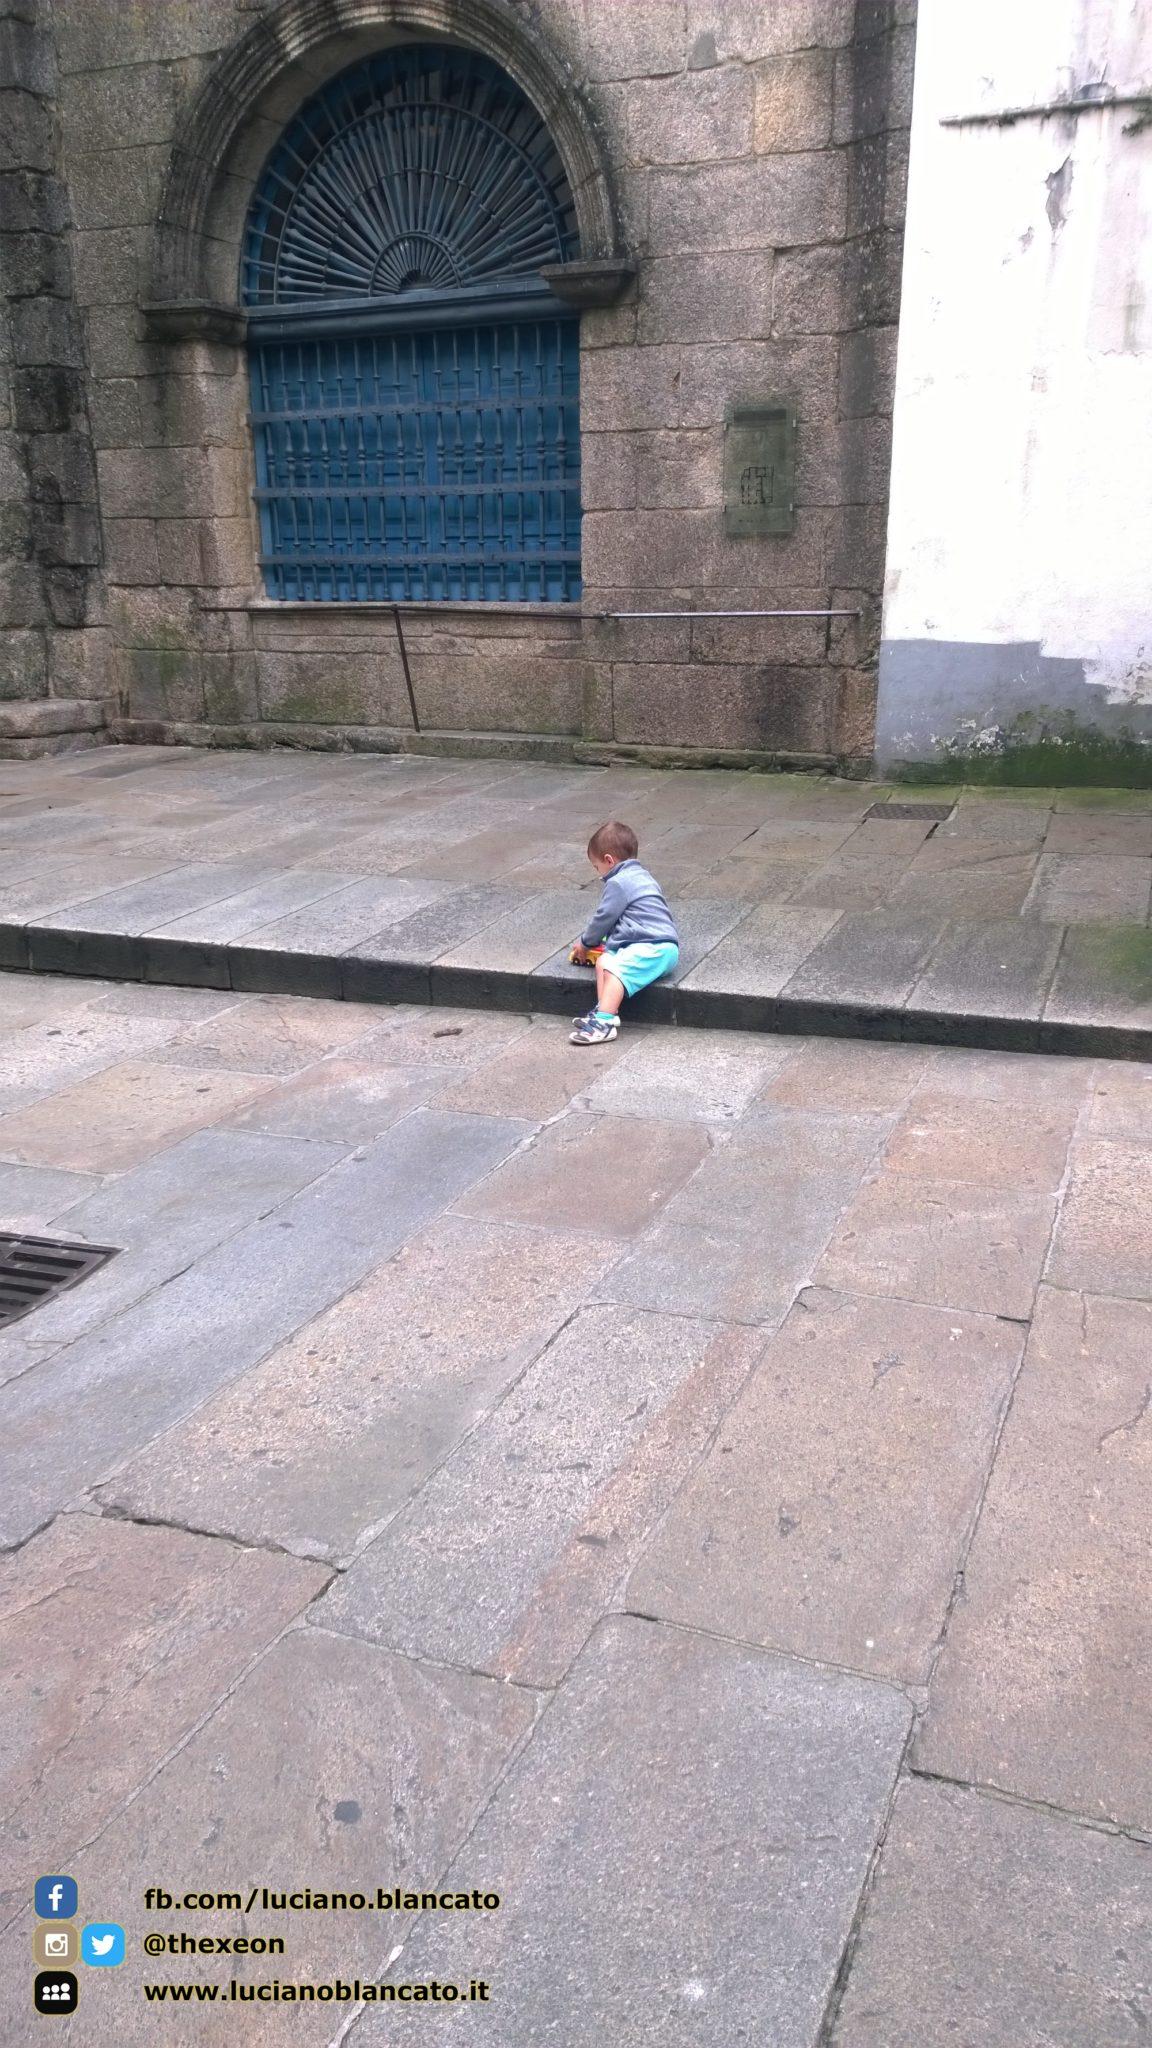 Santiago de Compostela - piccoli pellegrini crescono!